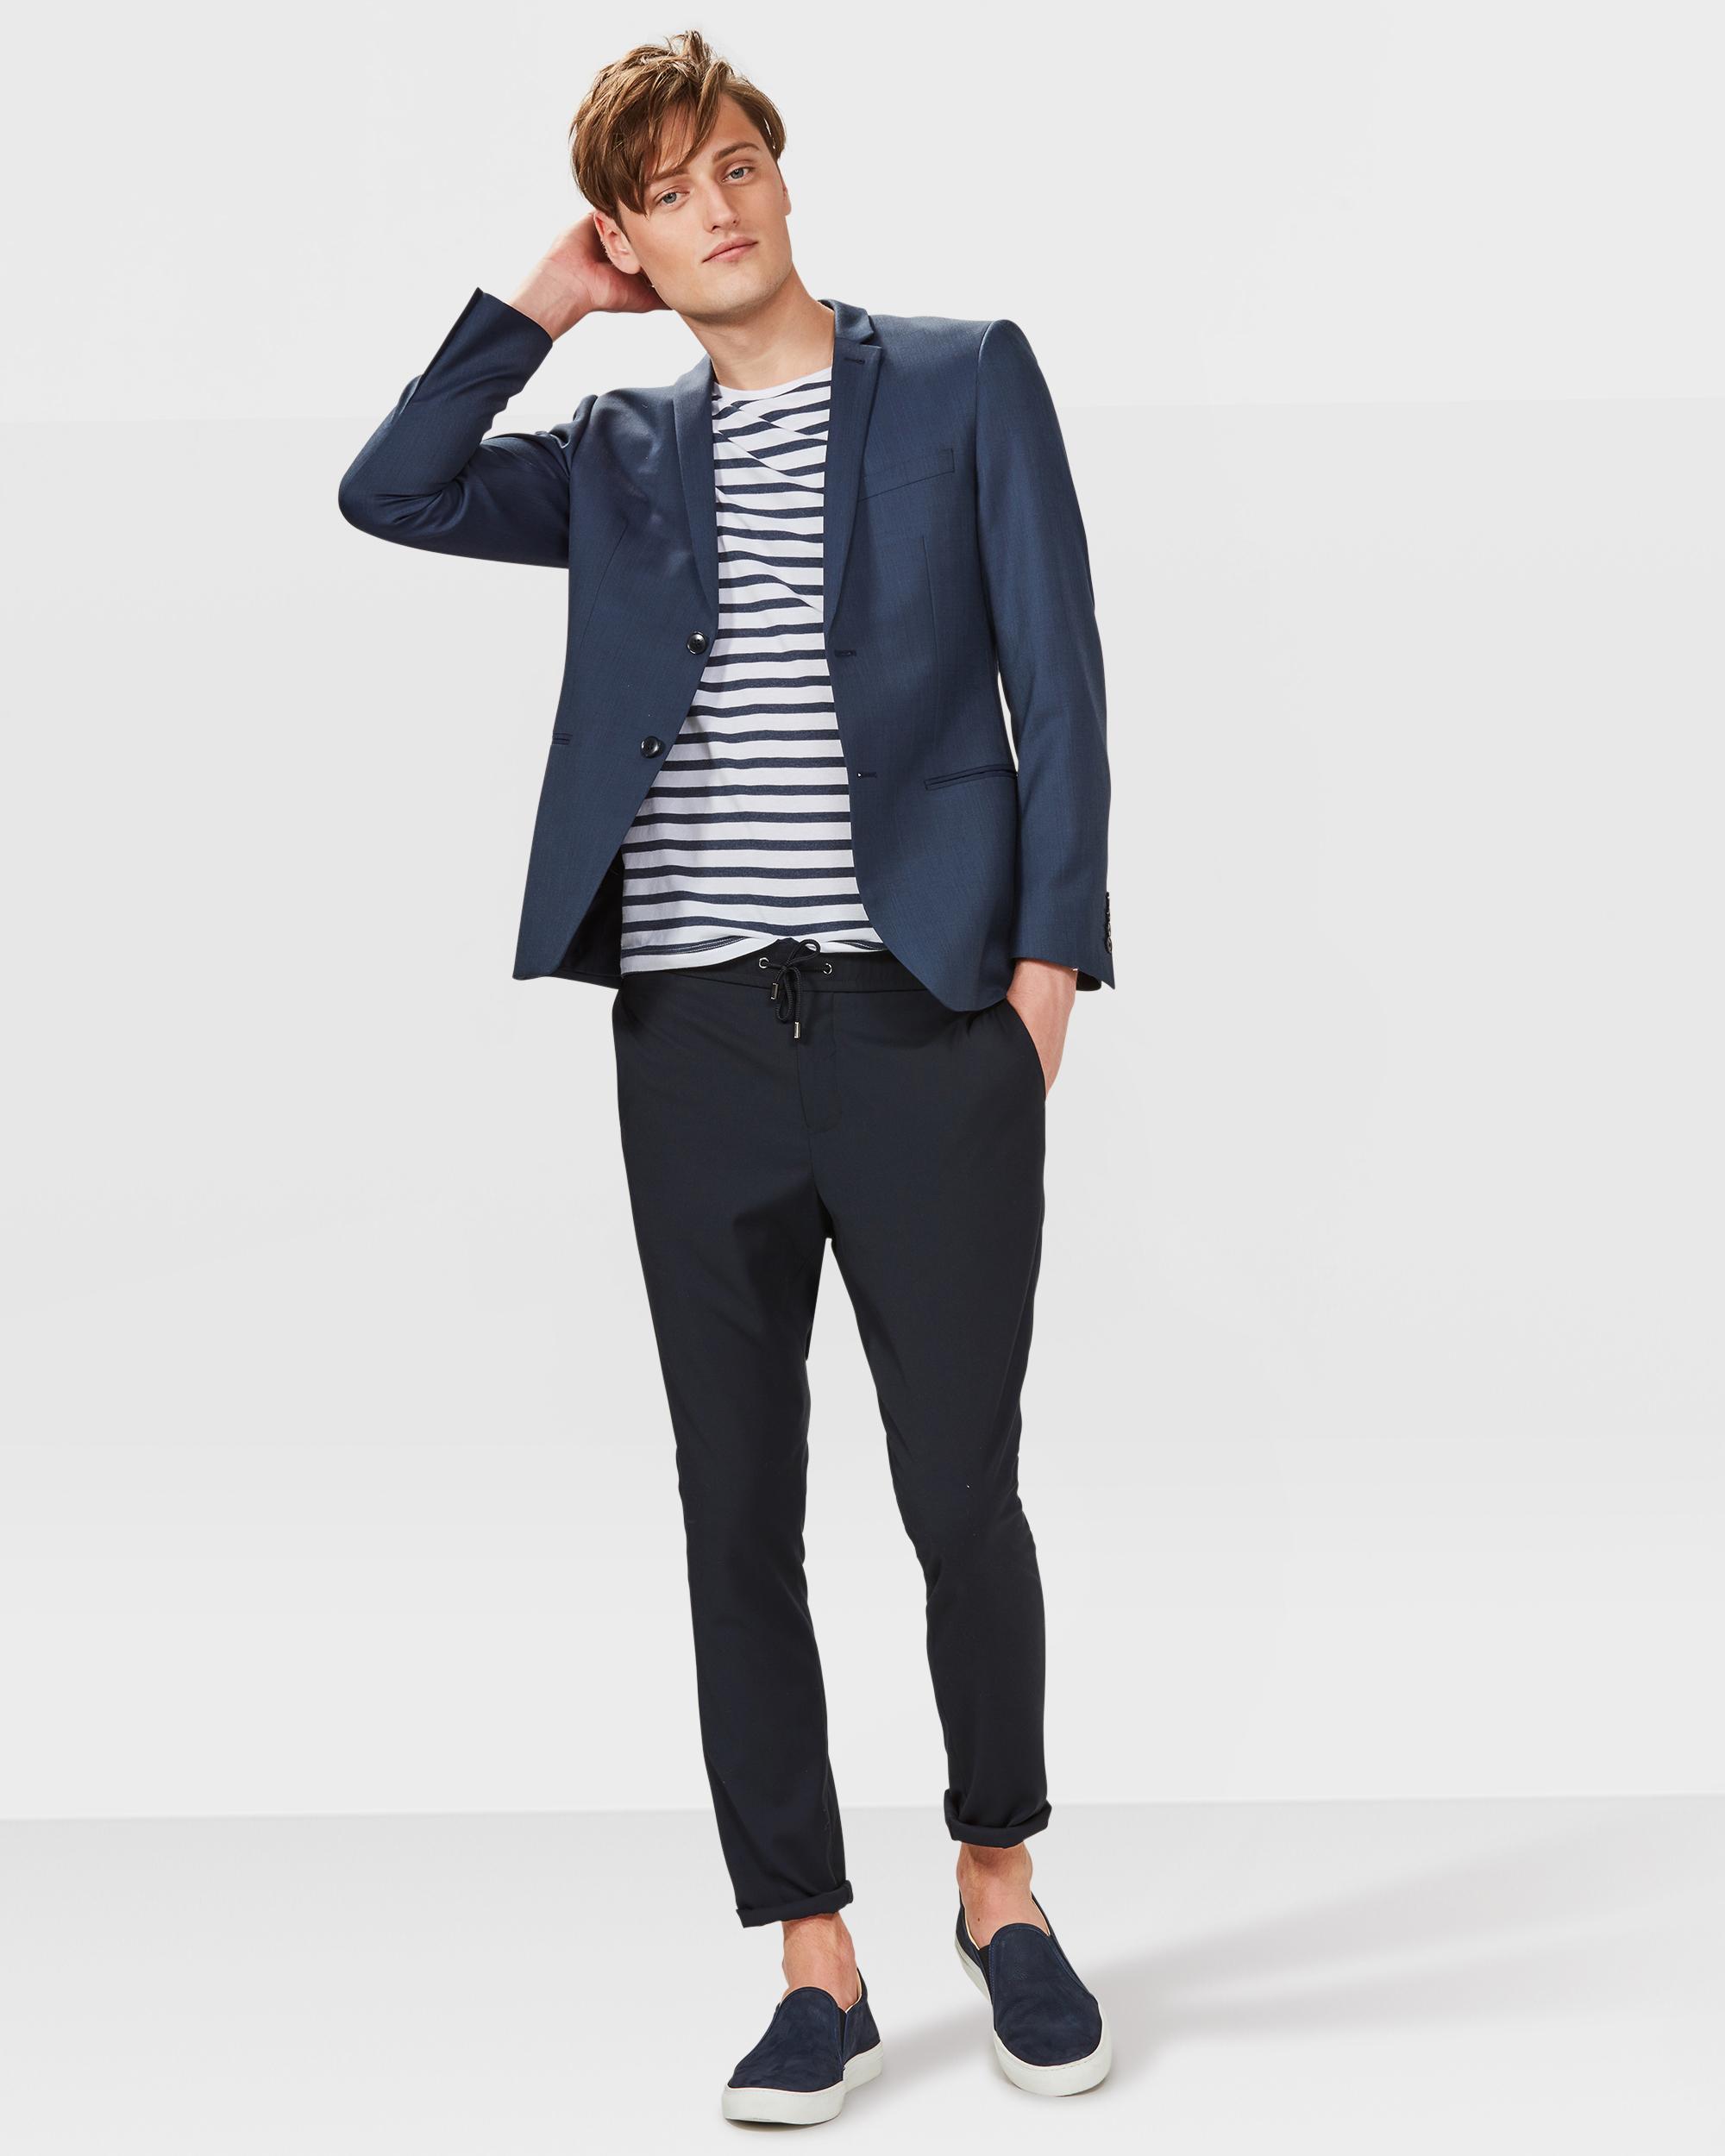 5 ways to wear_ 325